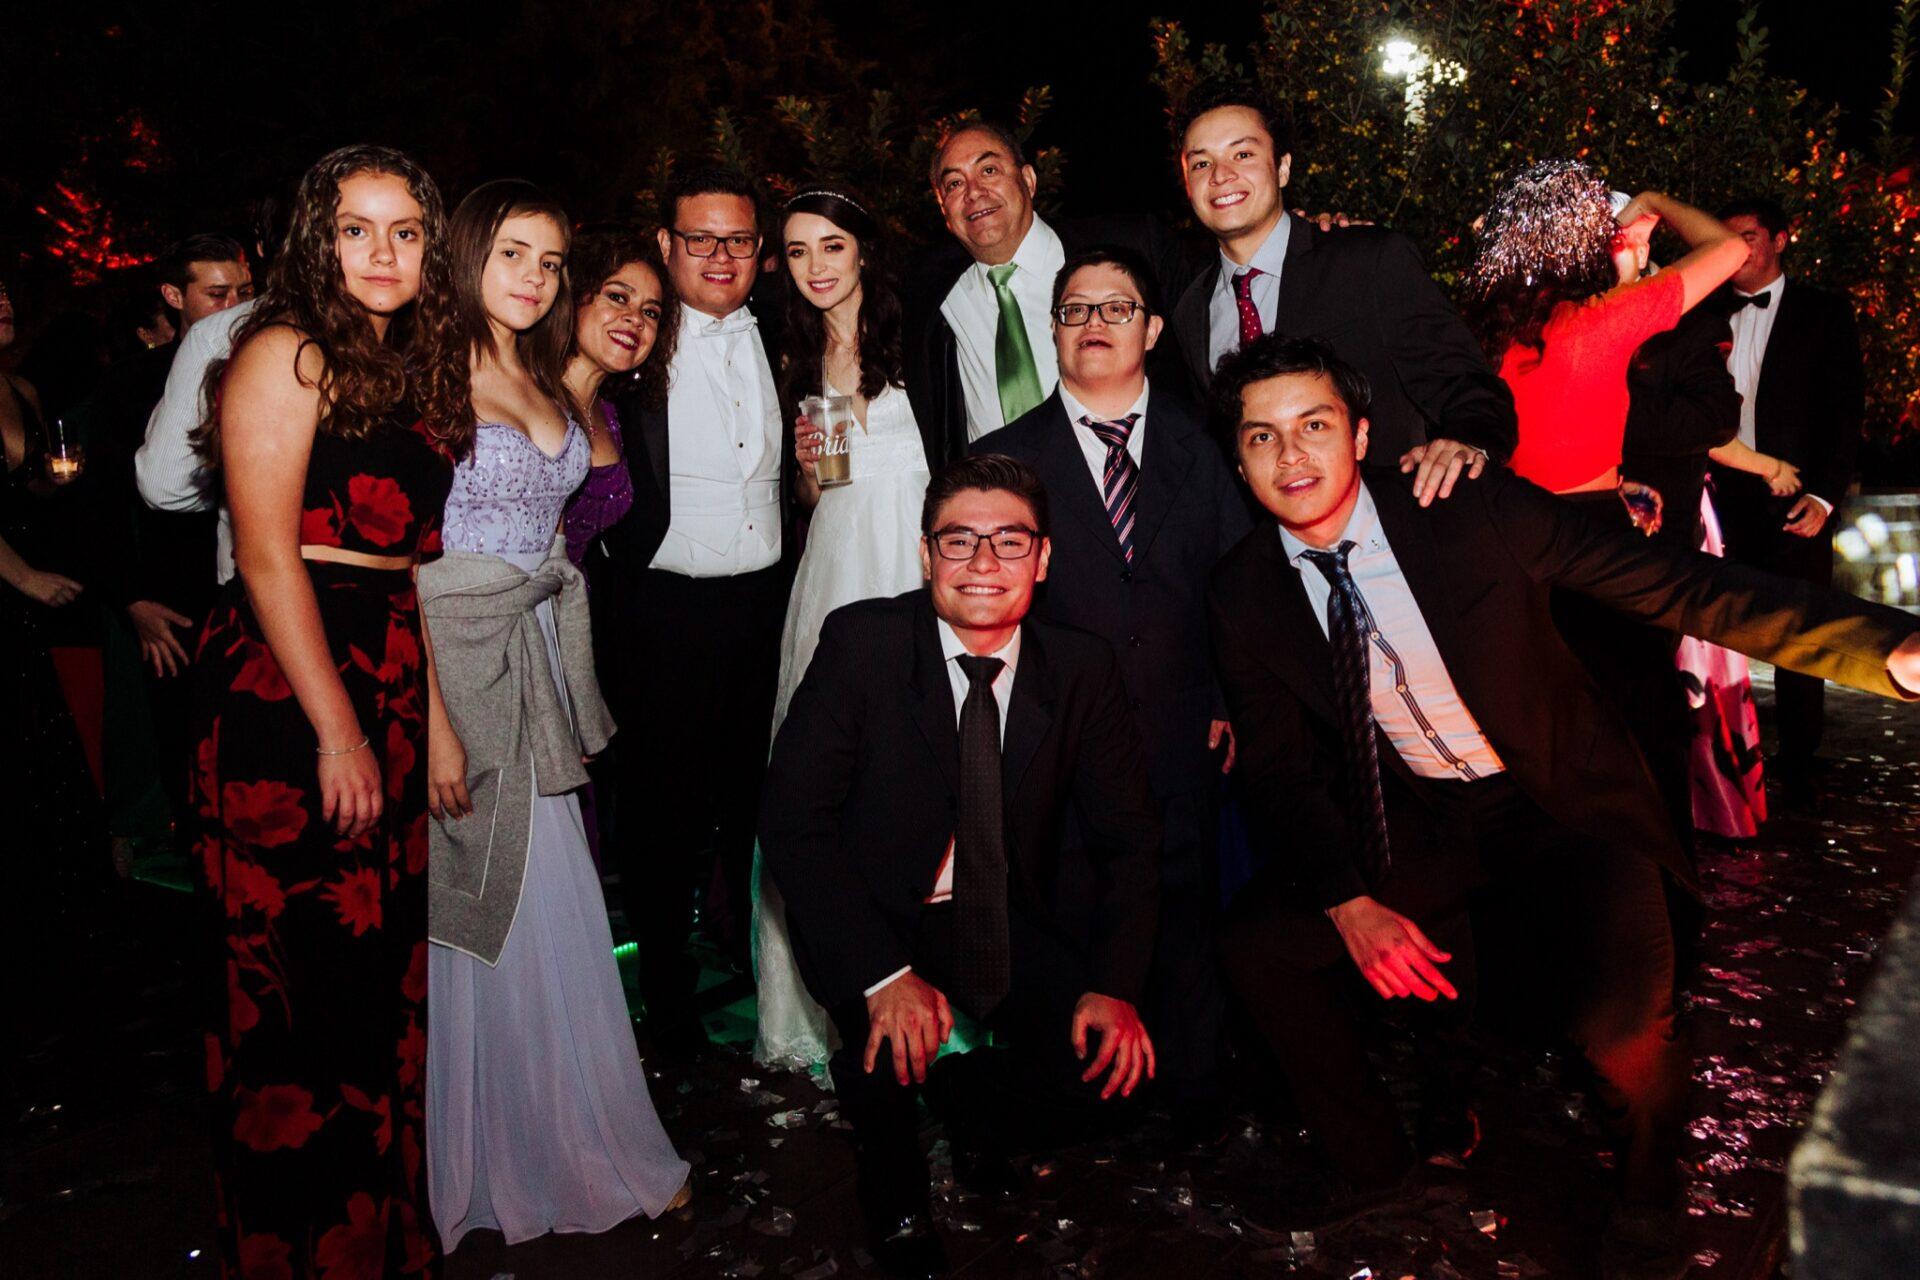 javier_noriega_fotografo_bodas_teul_zacatecas_wedding_photographer39